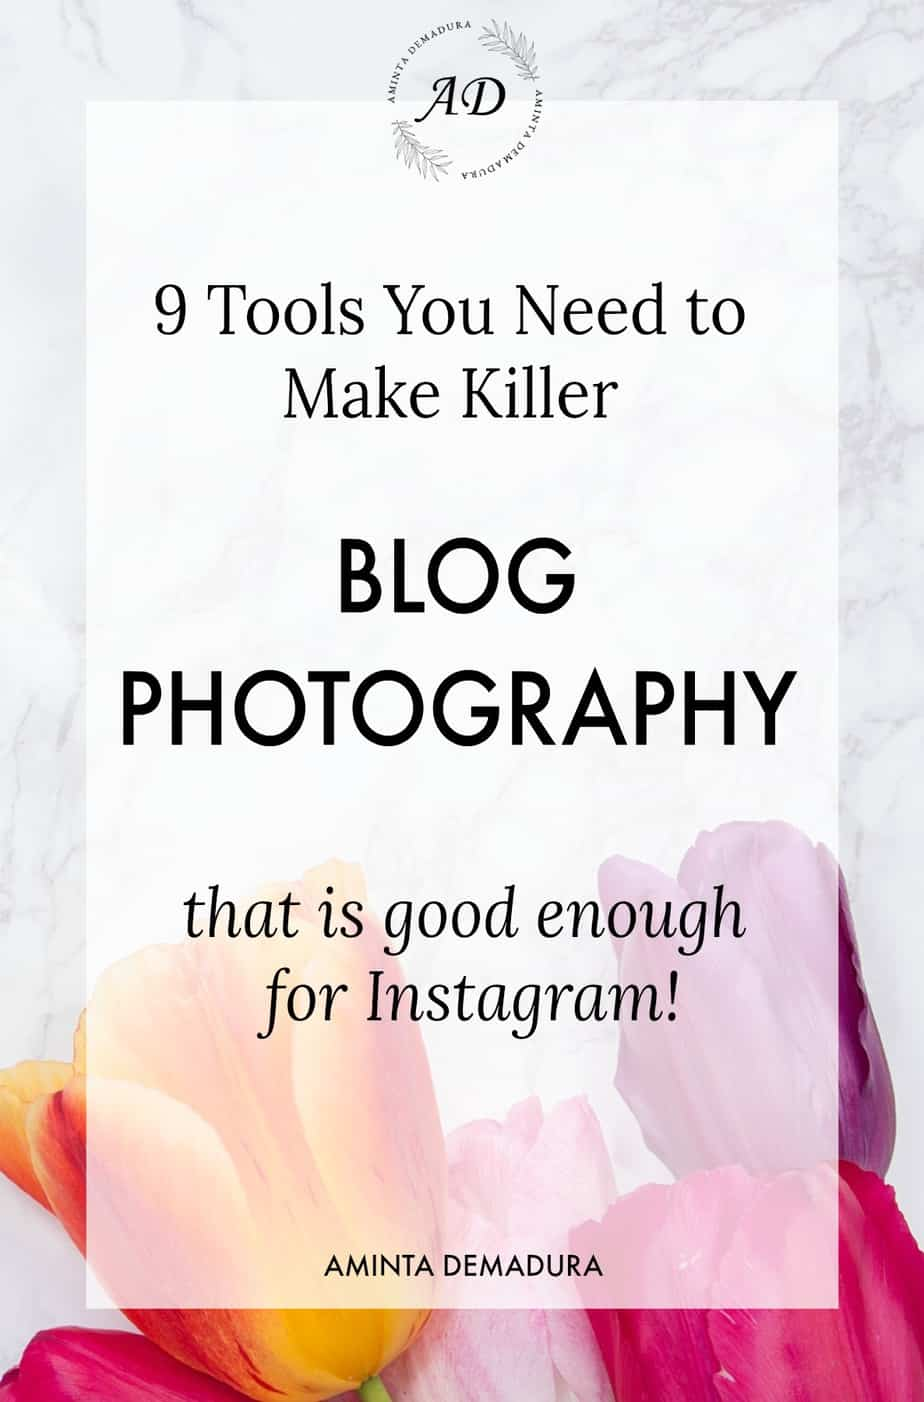 Blog Photography Tools